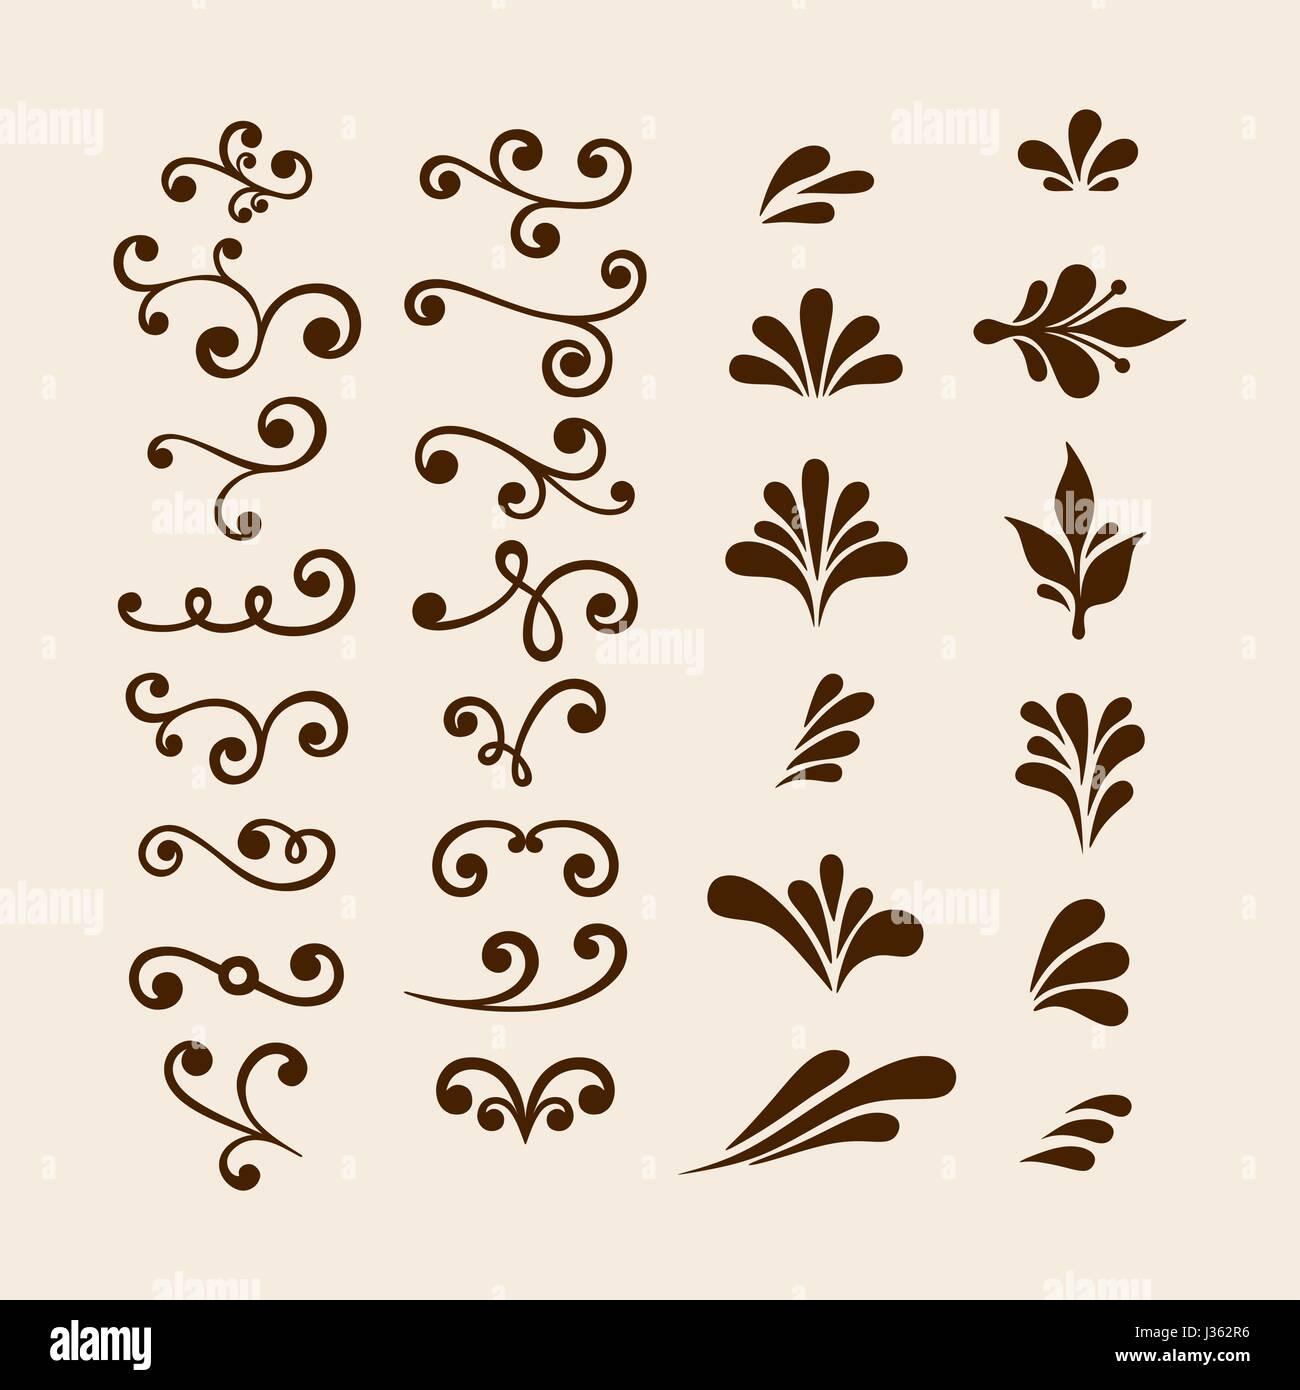 vector hand draw vintage floral design elements flowers decorative